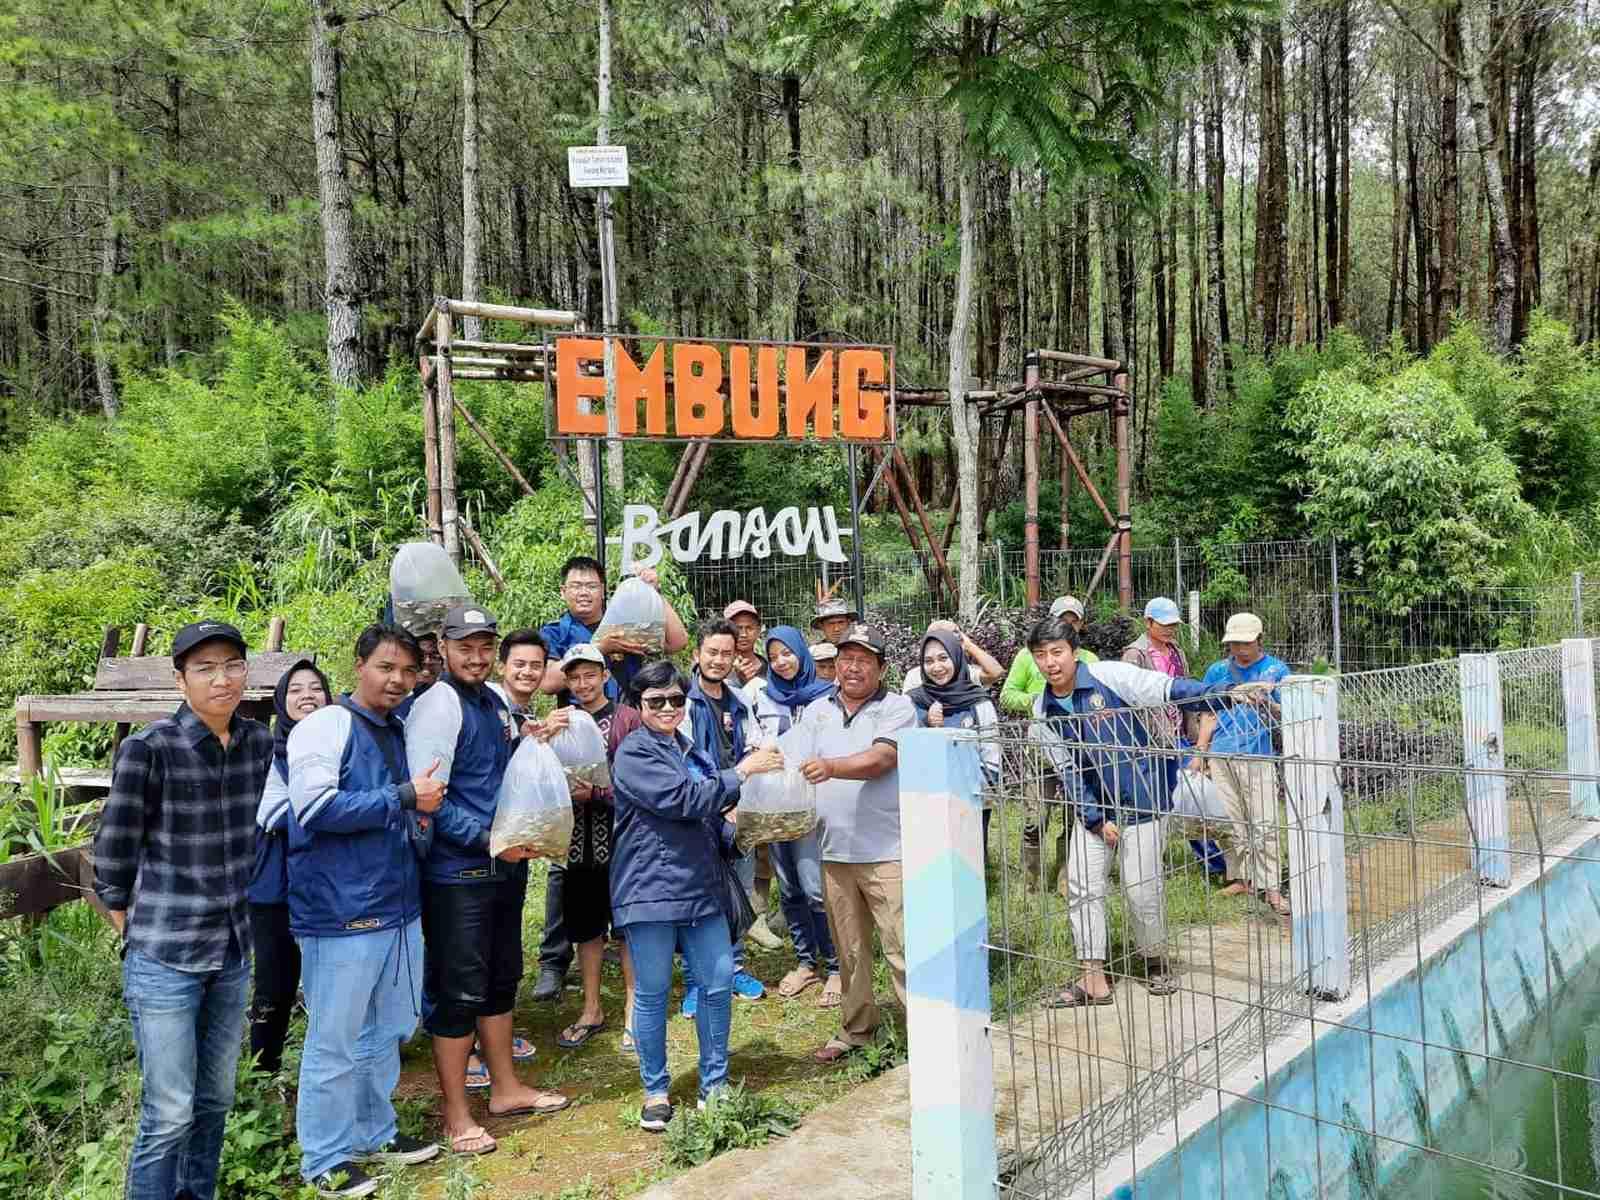 Kolaborasi Dosen dan Mahasiswa KKN Undip Kenalkan Edu Wisata Embung Bangau